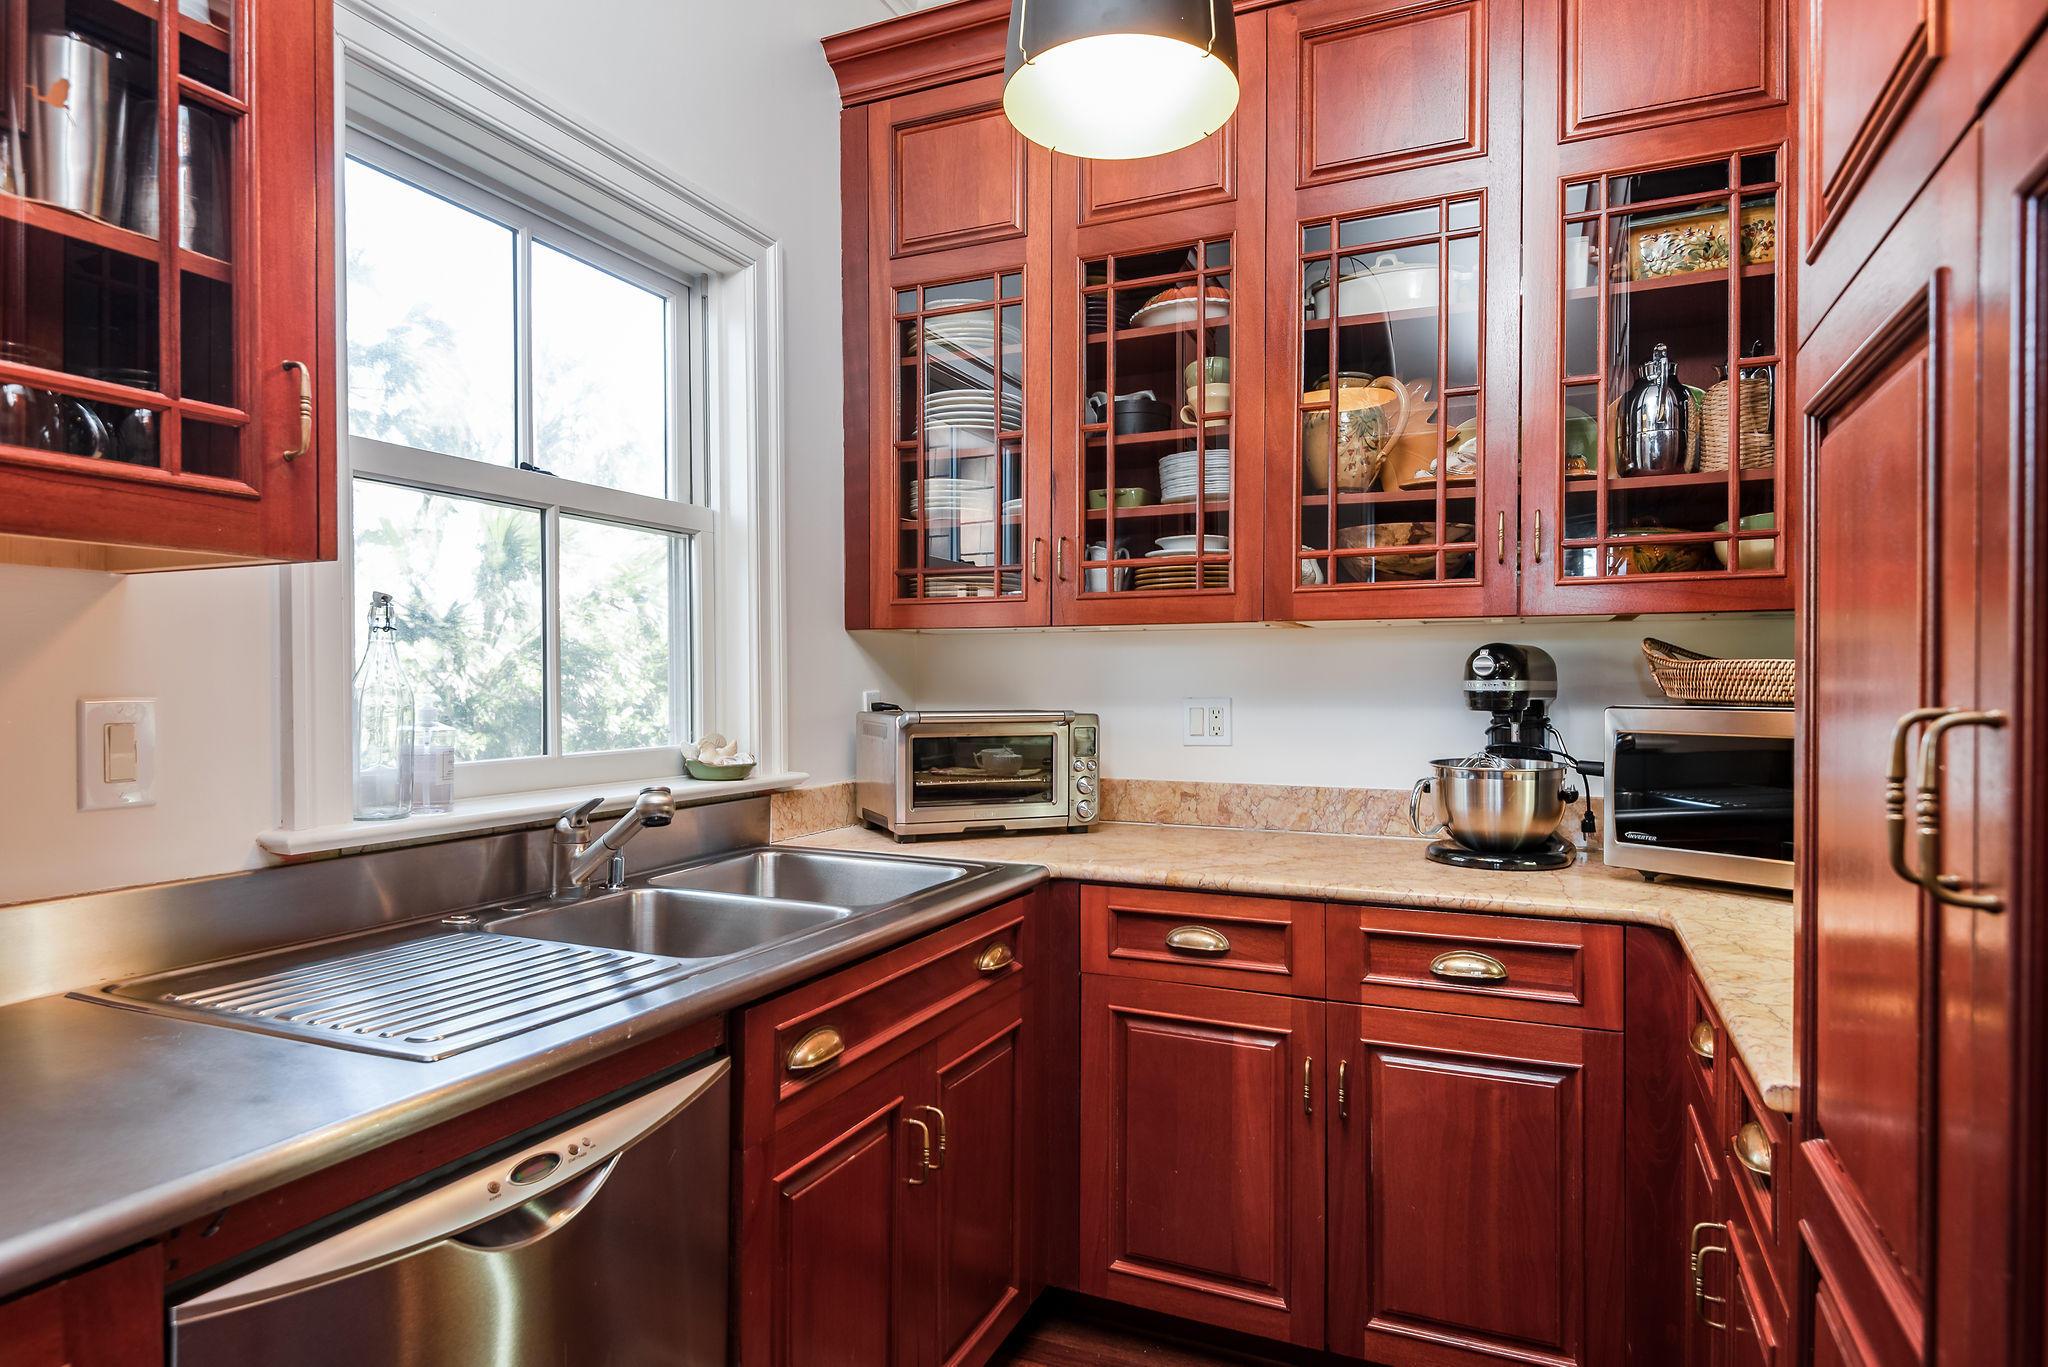 Kiawah Island Homes For Sale - 42 Salt Cedar, Kiawah Island, SC - 46